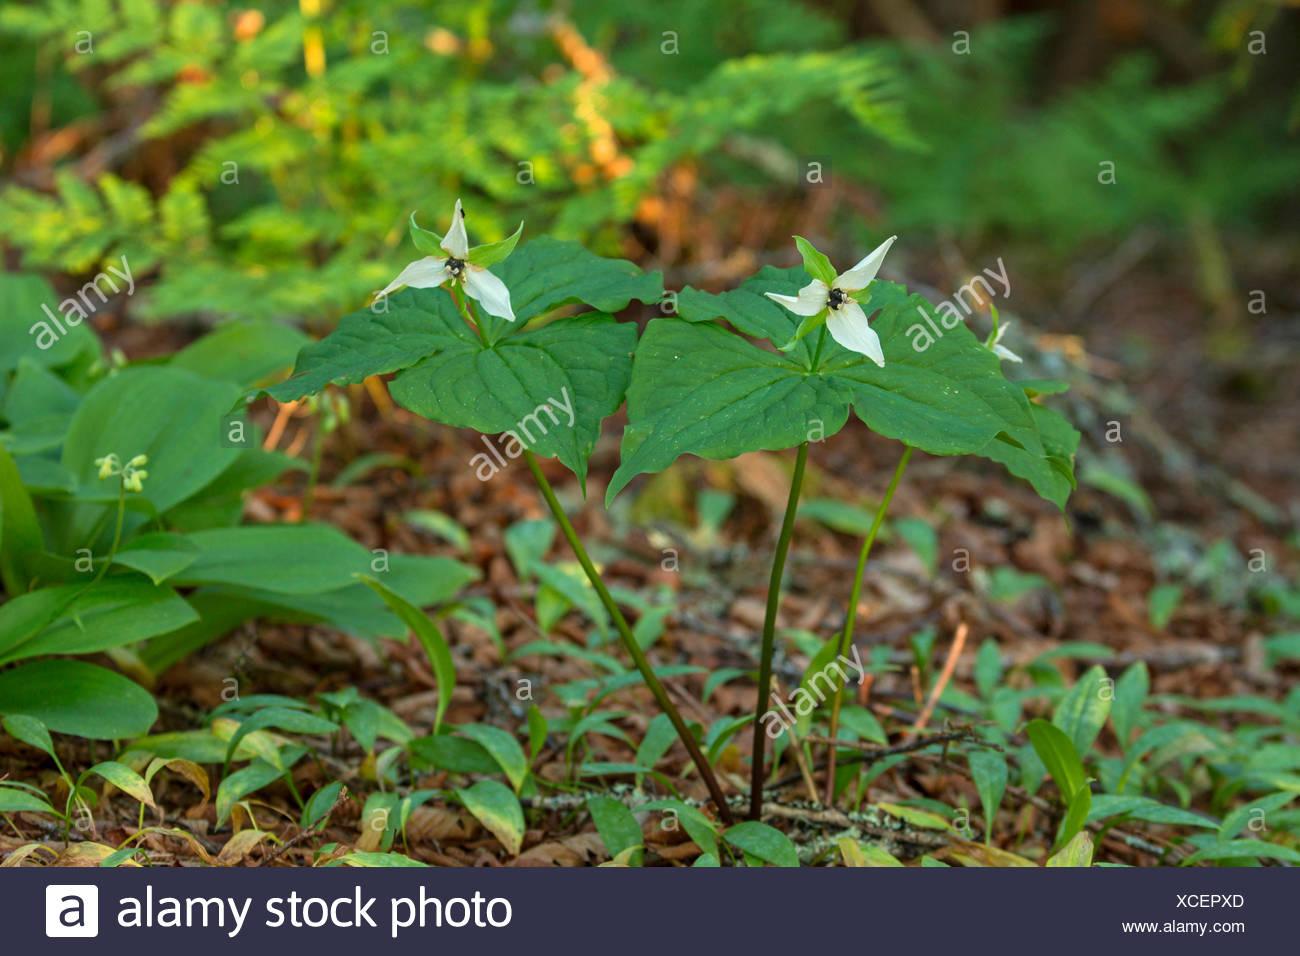 stinking-benjamin, ill-scent trillium (Trillium erectum), blooming, USA, Tennessee, Great Smoky Mountains National Park - Stock Image